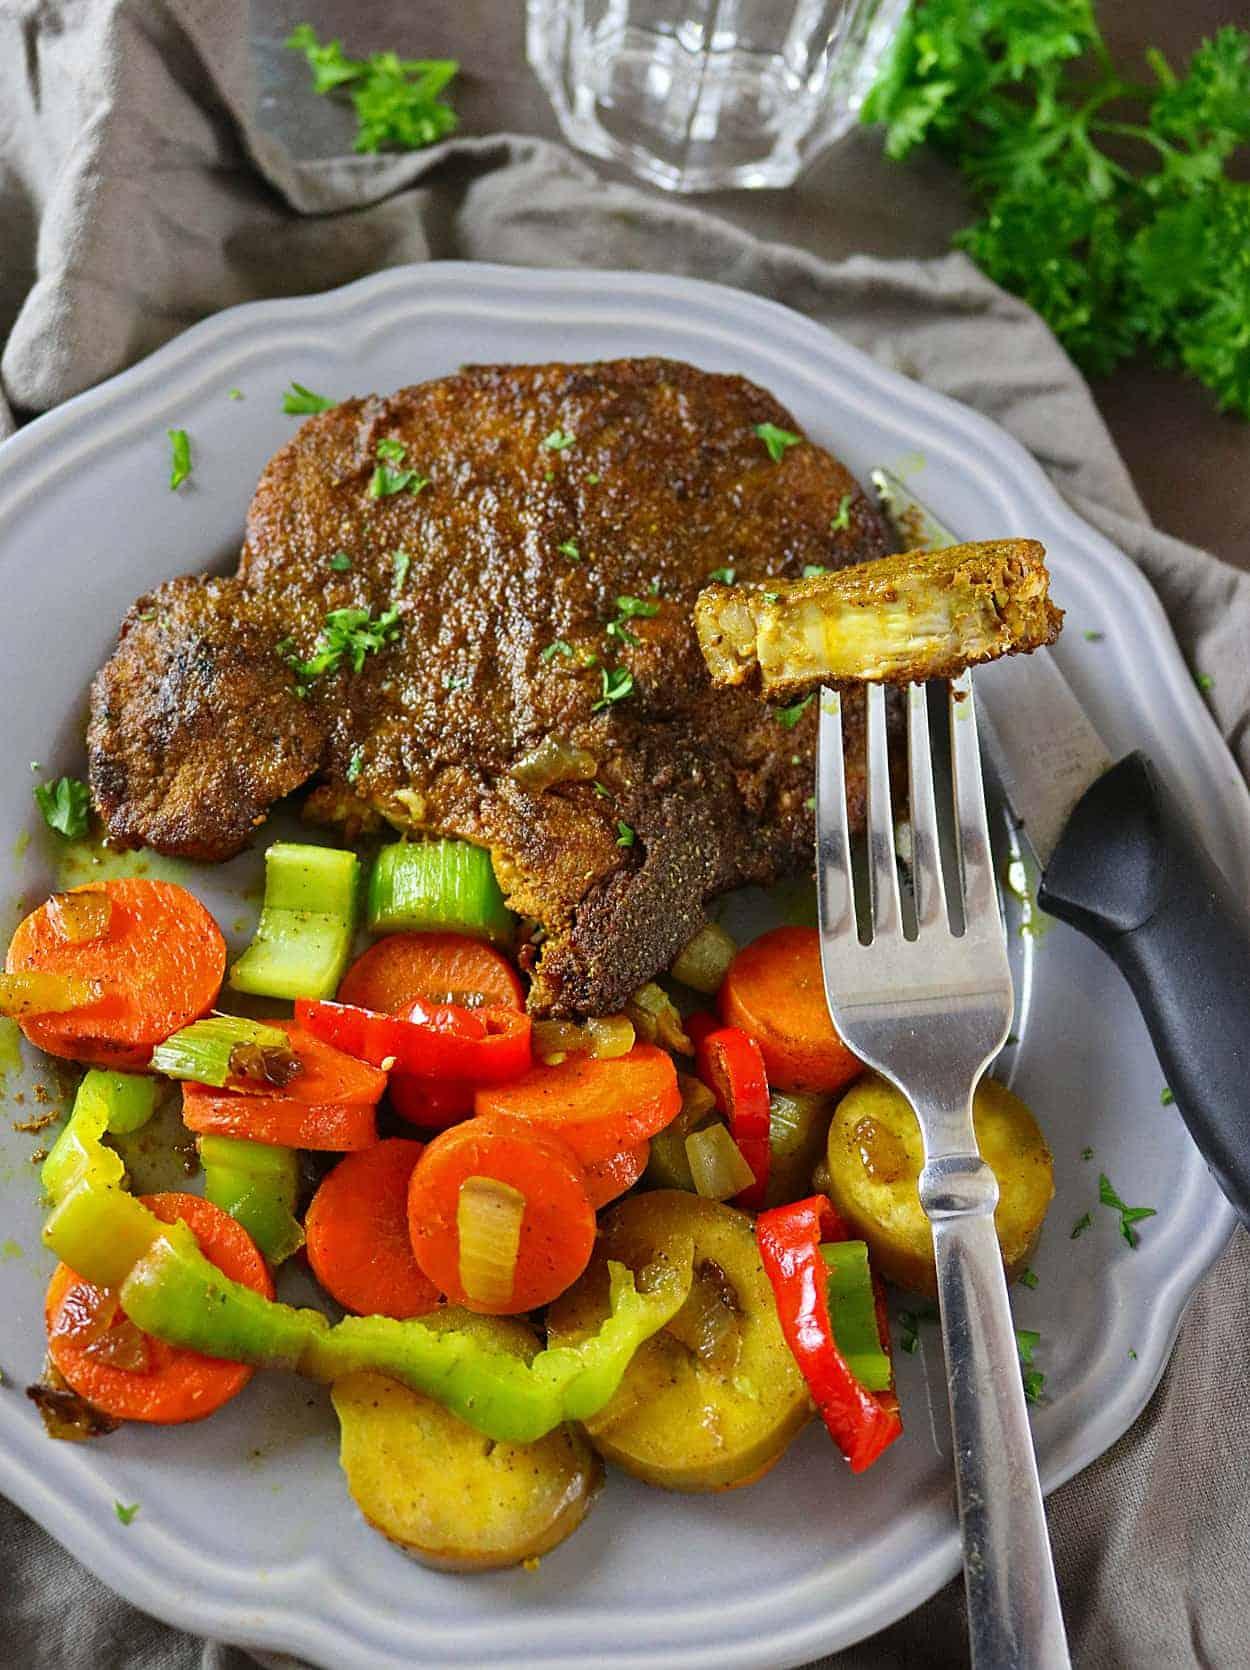 Turmeric & Garam Masala Spiced, Grilled Pork